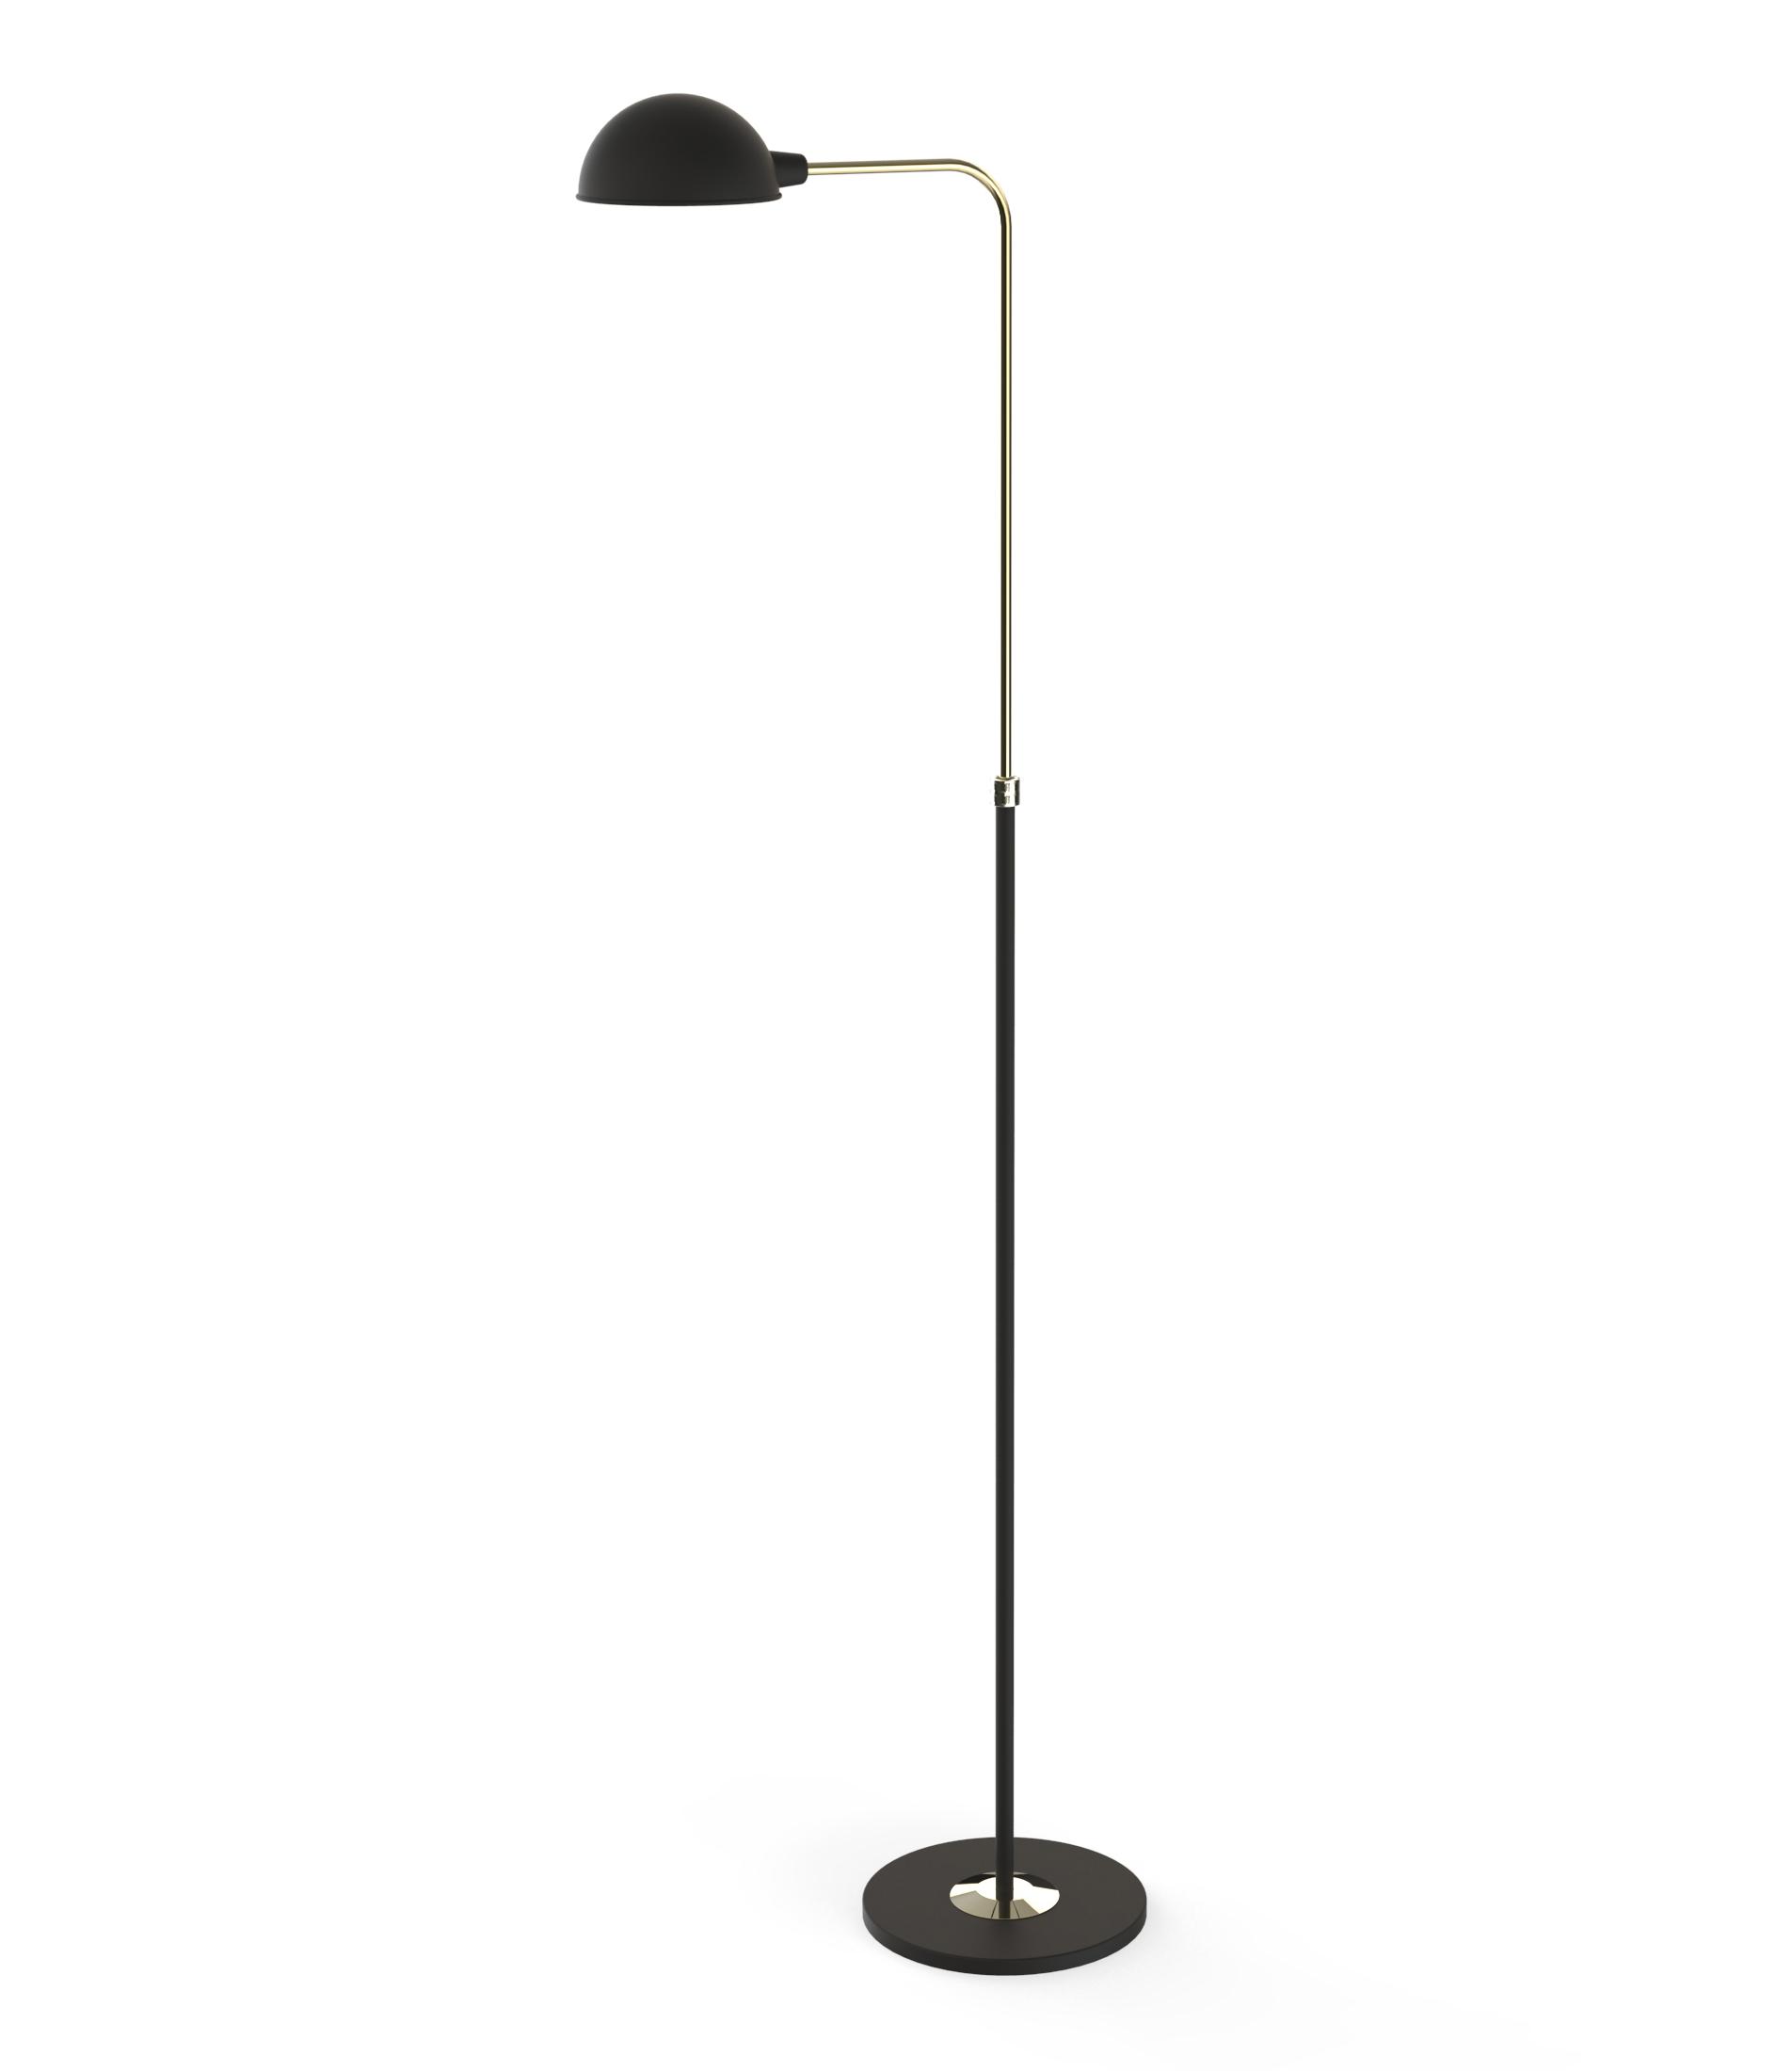 mid-century floor lamp Mid-Century Floor Lamps Brighten Up Open Plan Living Room herbie floor detail 02 HR 1